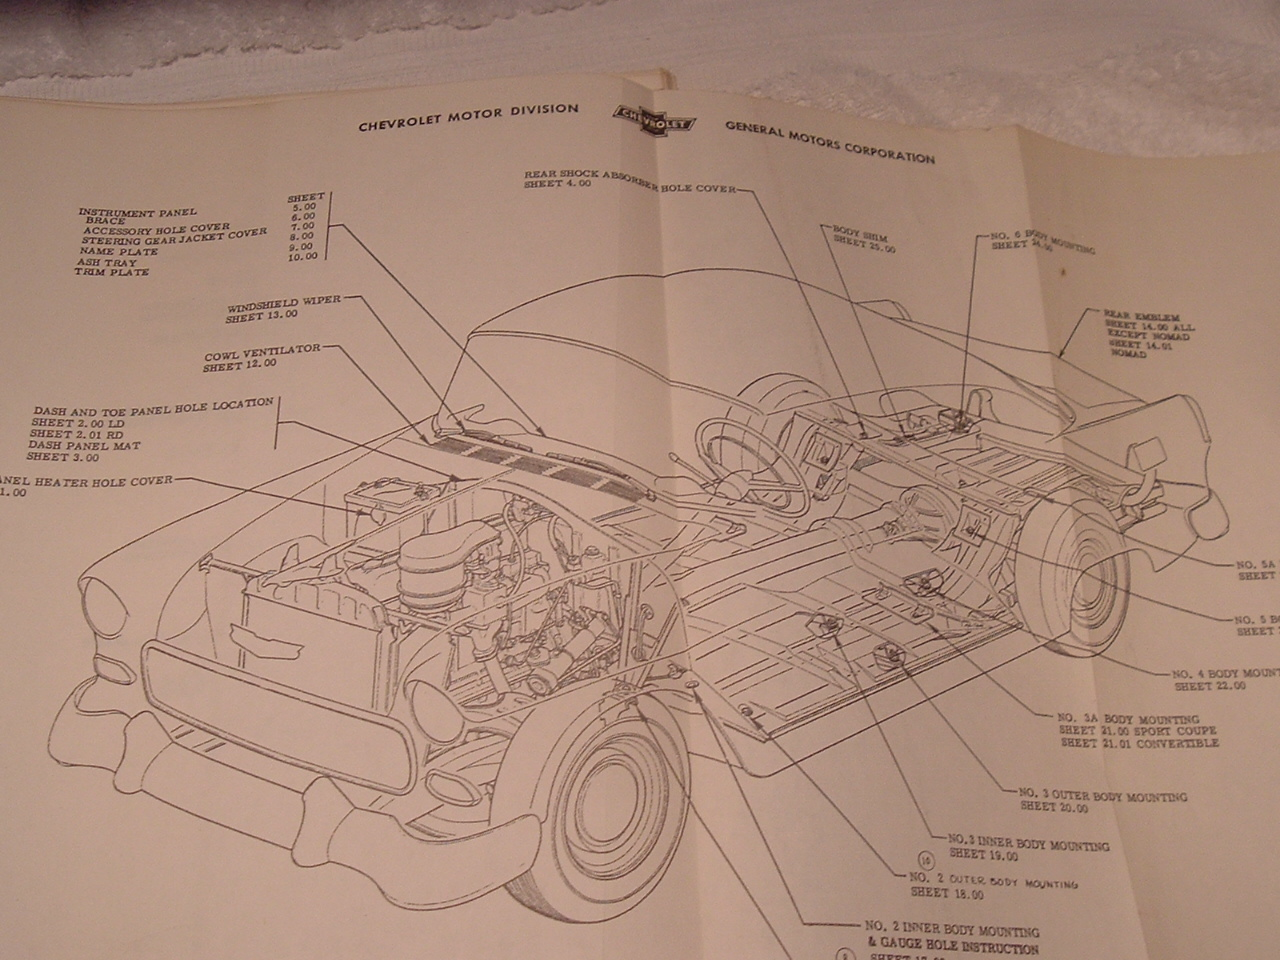 1955 Chevrolet assembly manual (a 55 chev asm man)